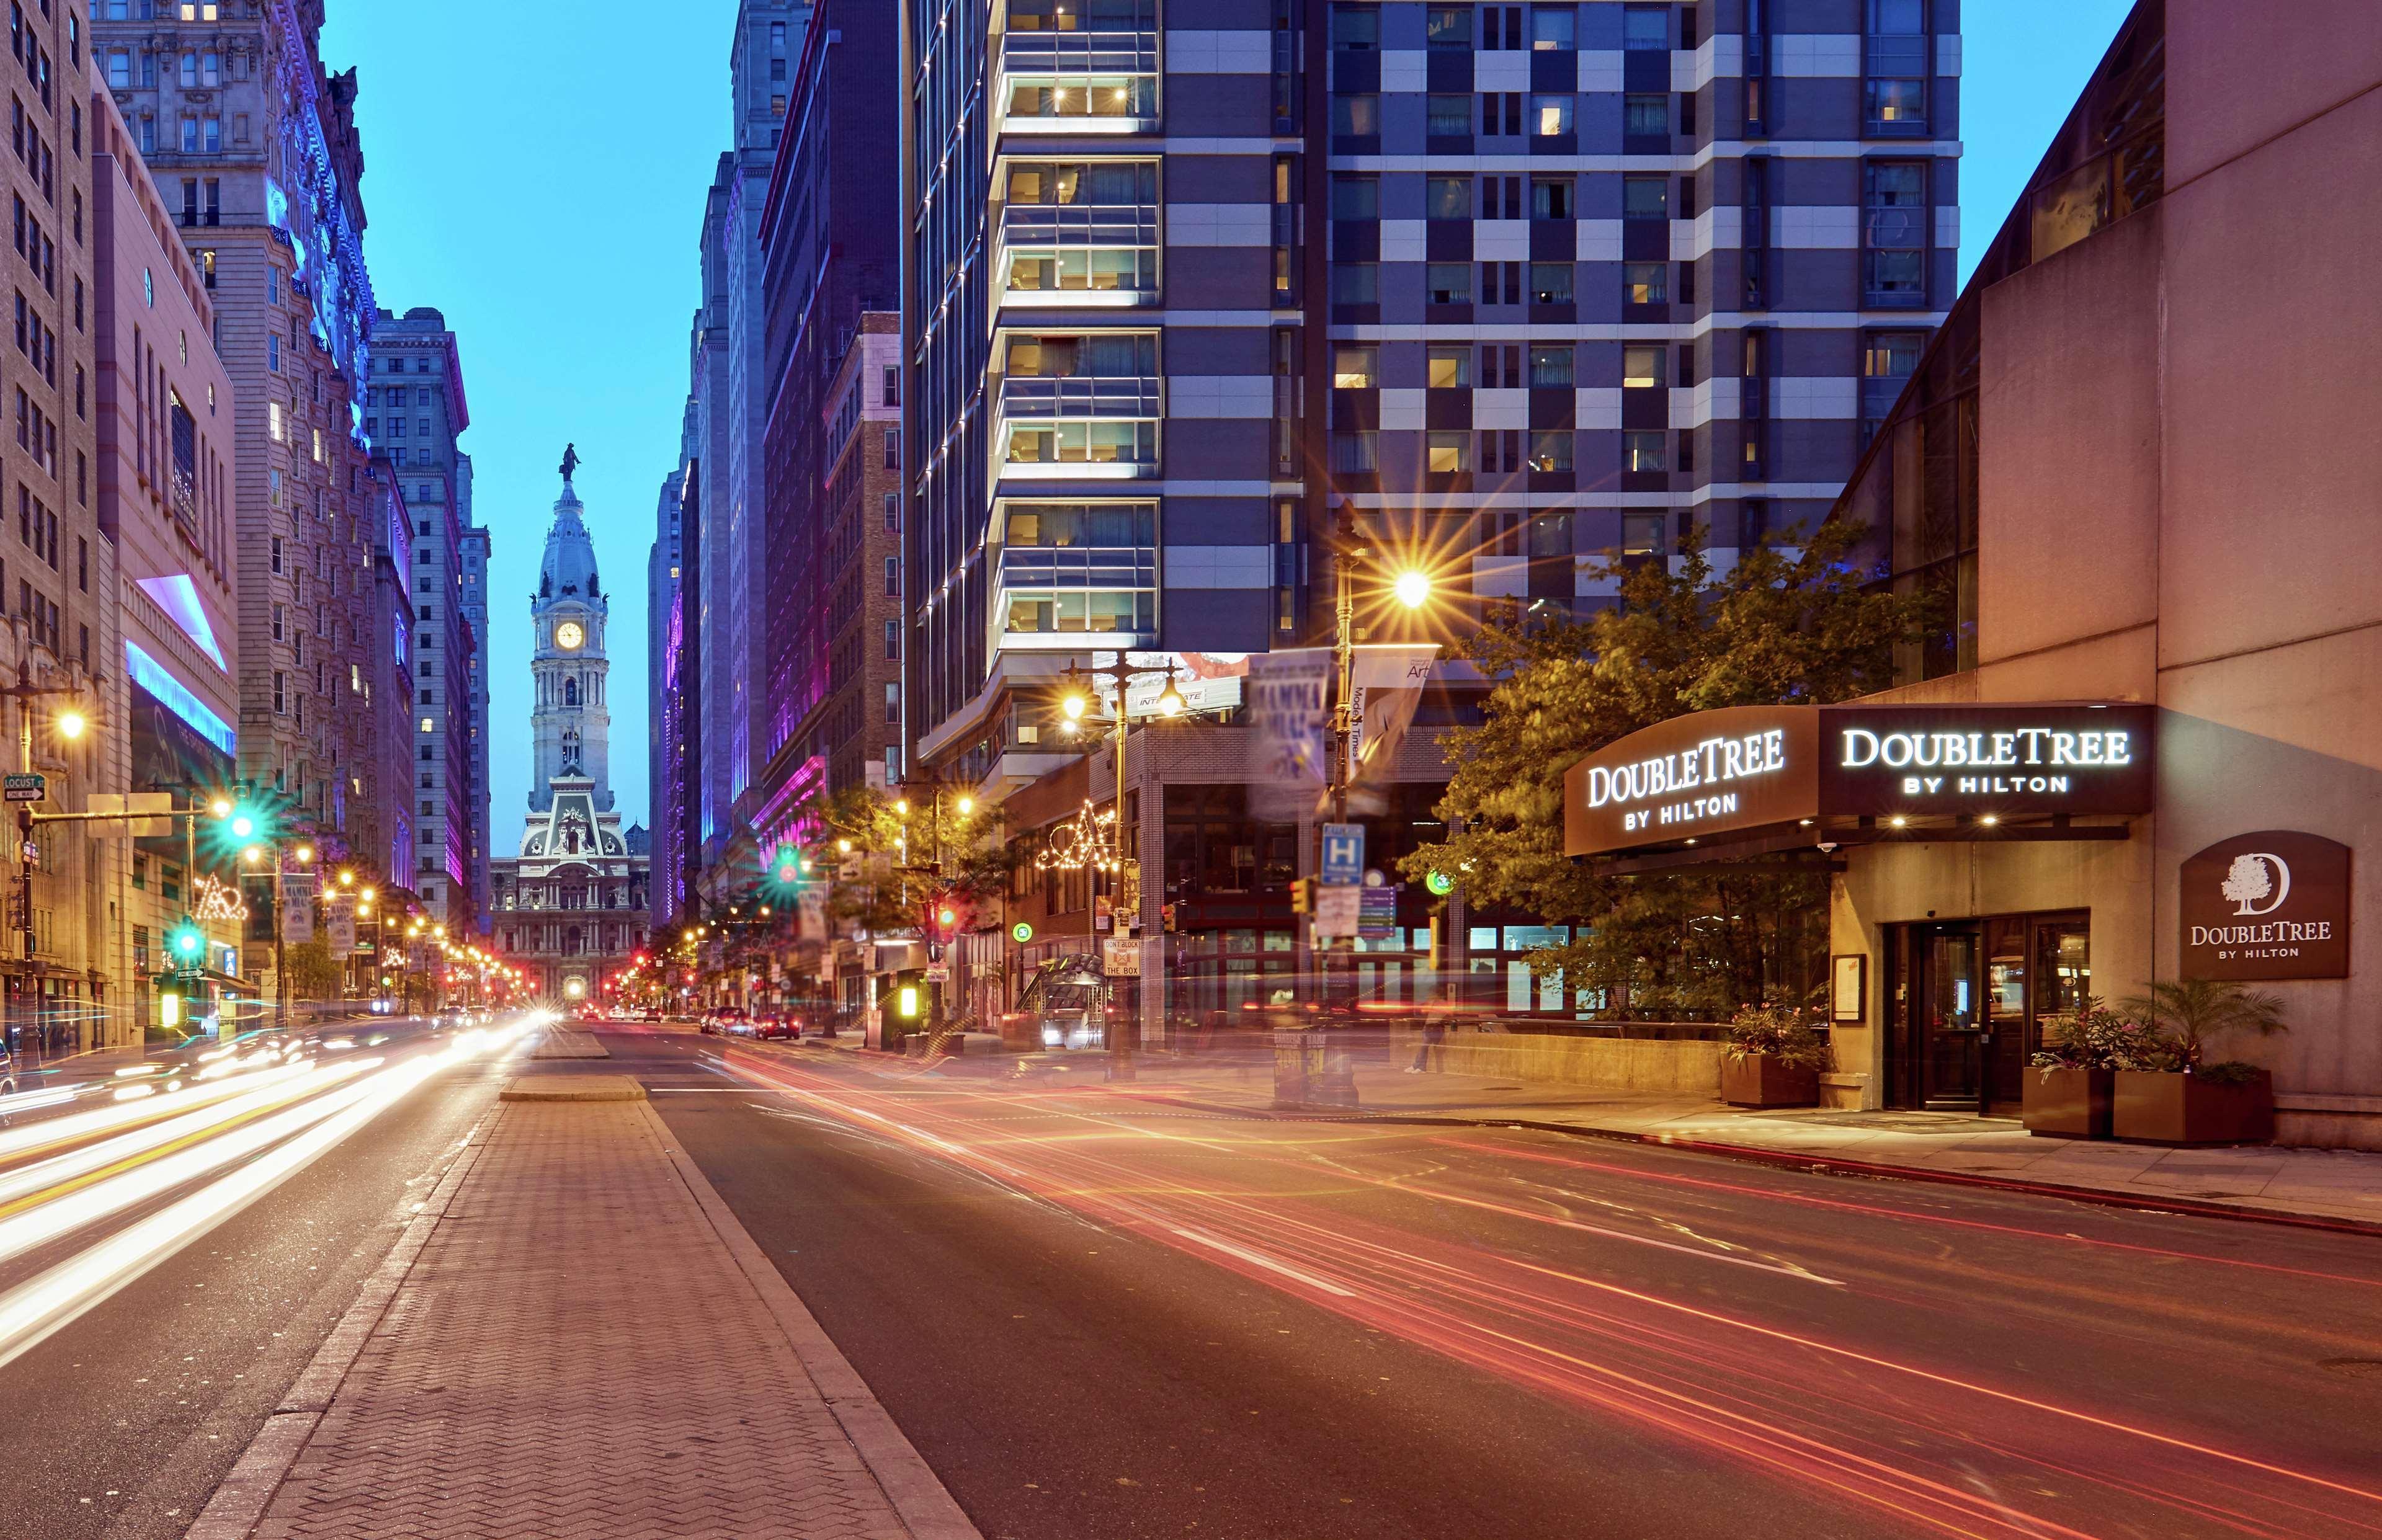 Doubletree Hotel Philadelphia, Philadelphia